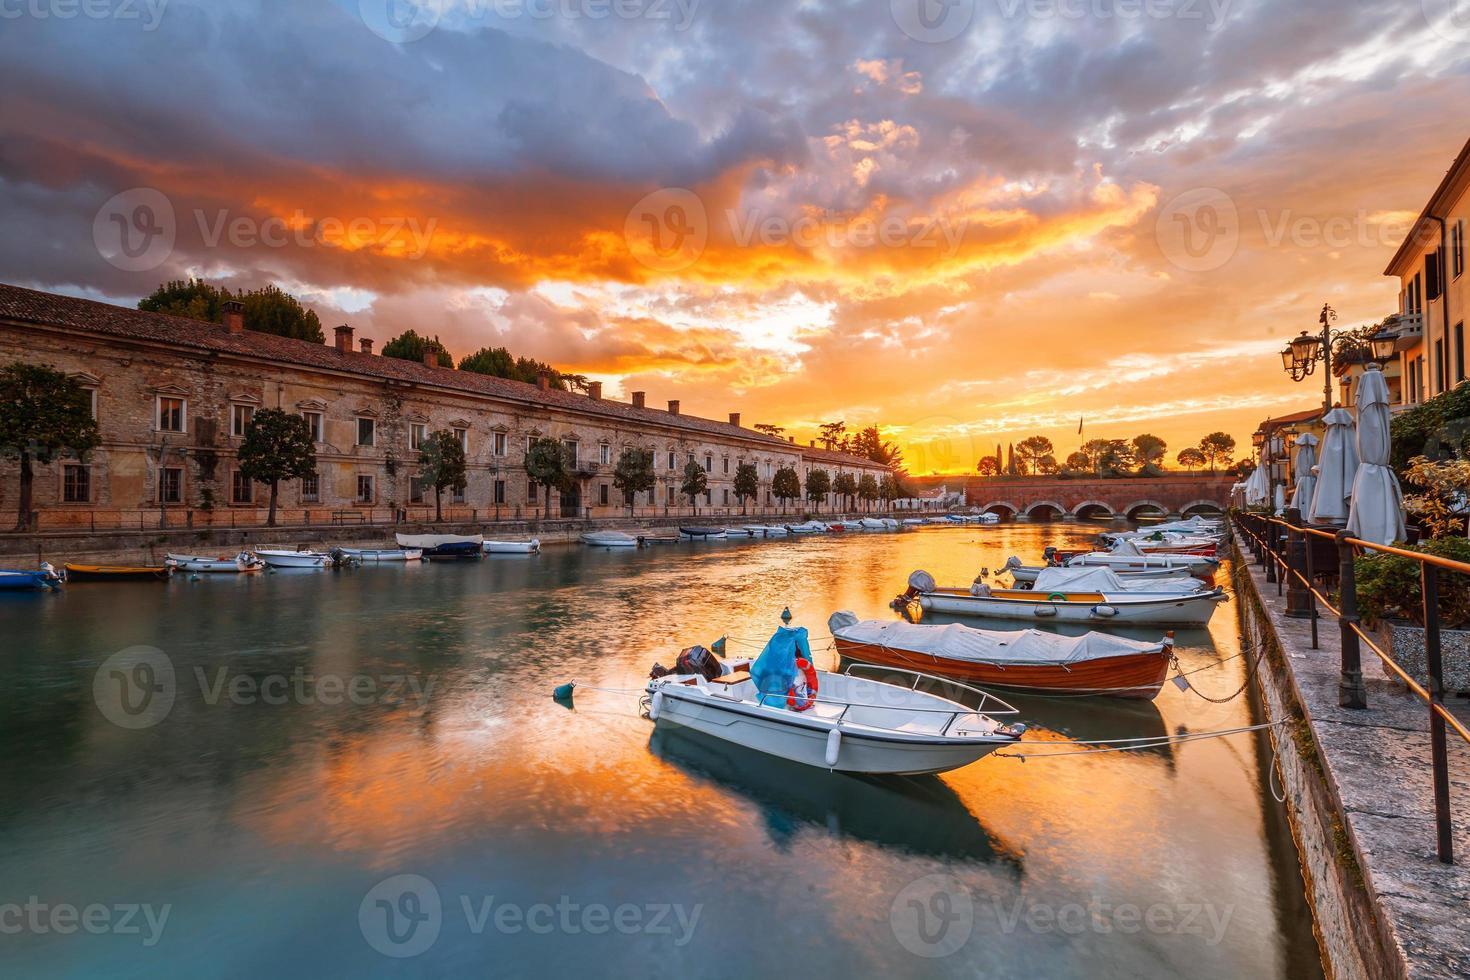 Klimahafen in Peschiera del Garda am Gardasee foto